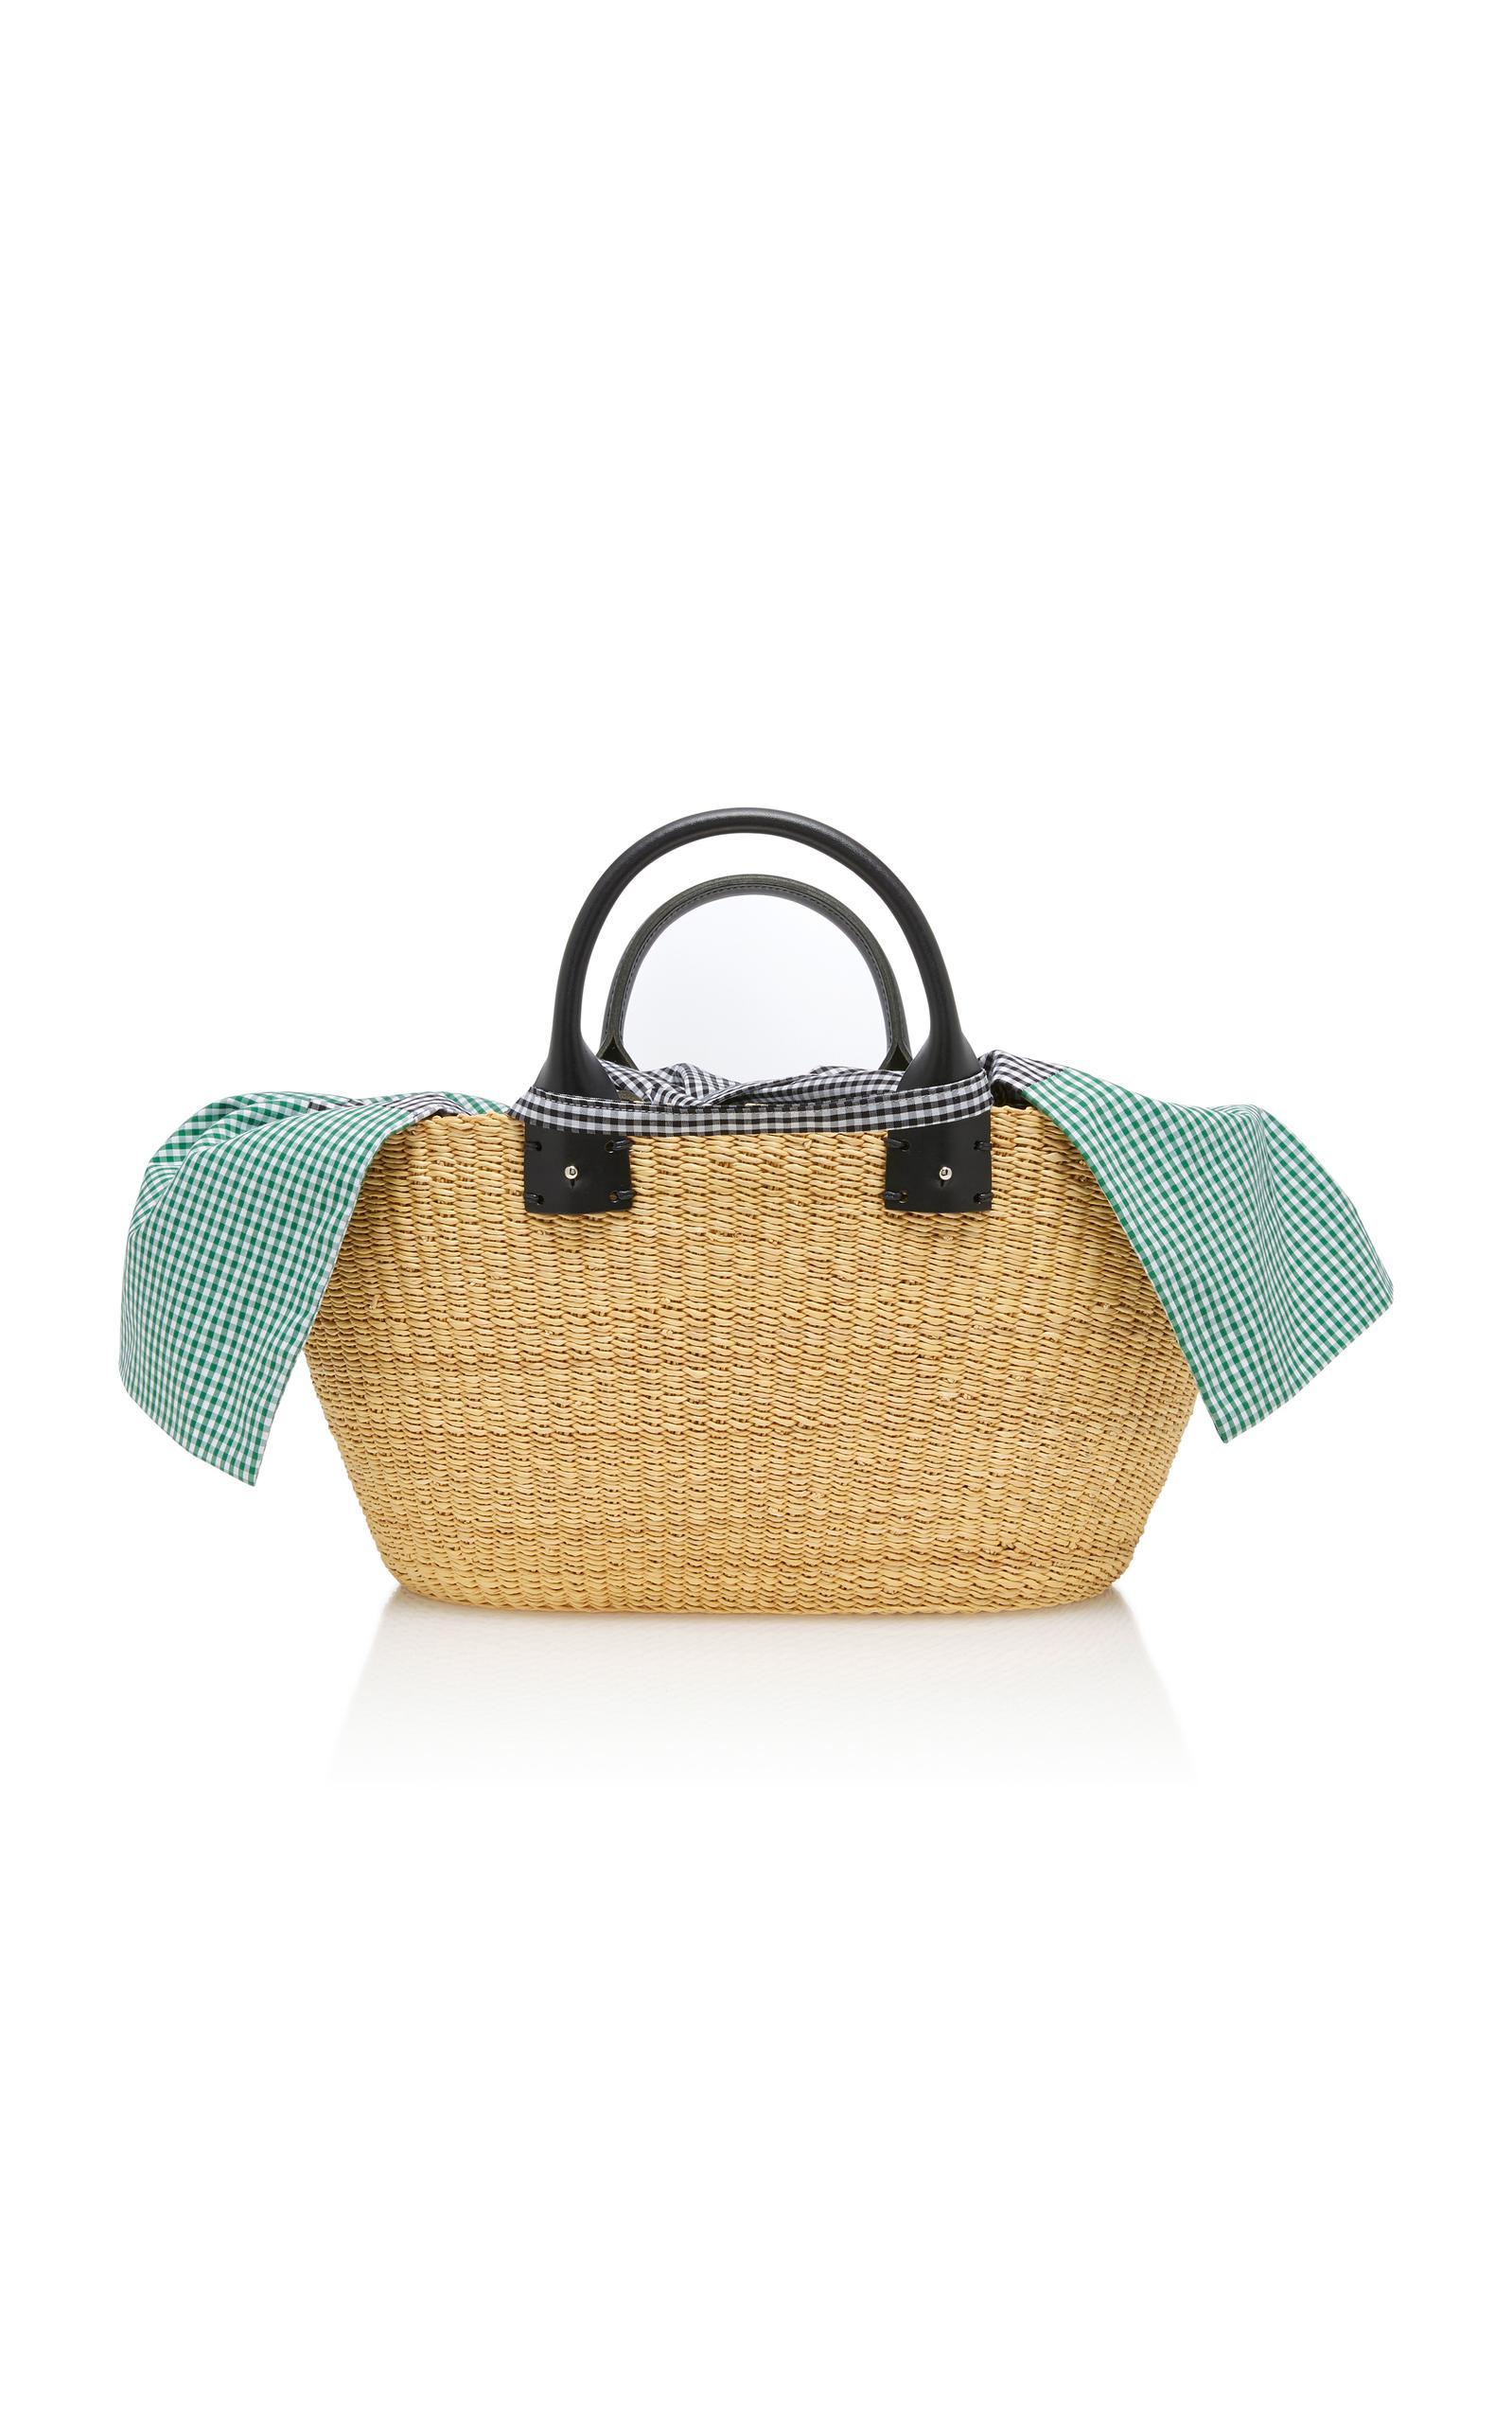 Discounts For Sale Giorgio Vichy Pouch Straw Bag Muuñ Free Shipping Footlocker Finishline wEiK1F